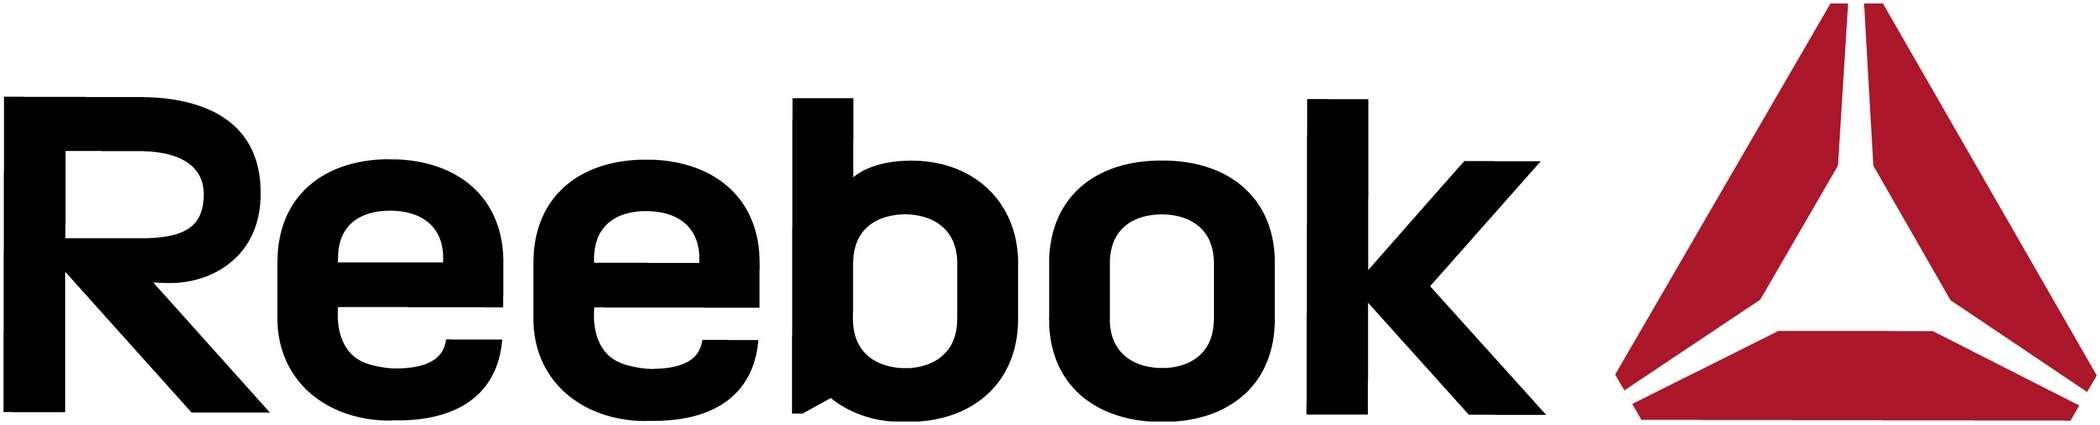 Reebok Logo [New] Download Vector.